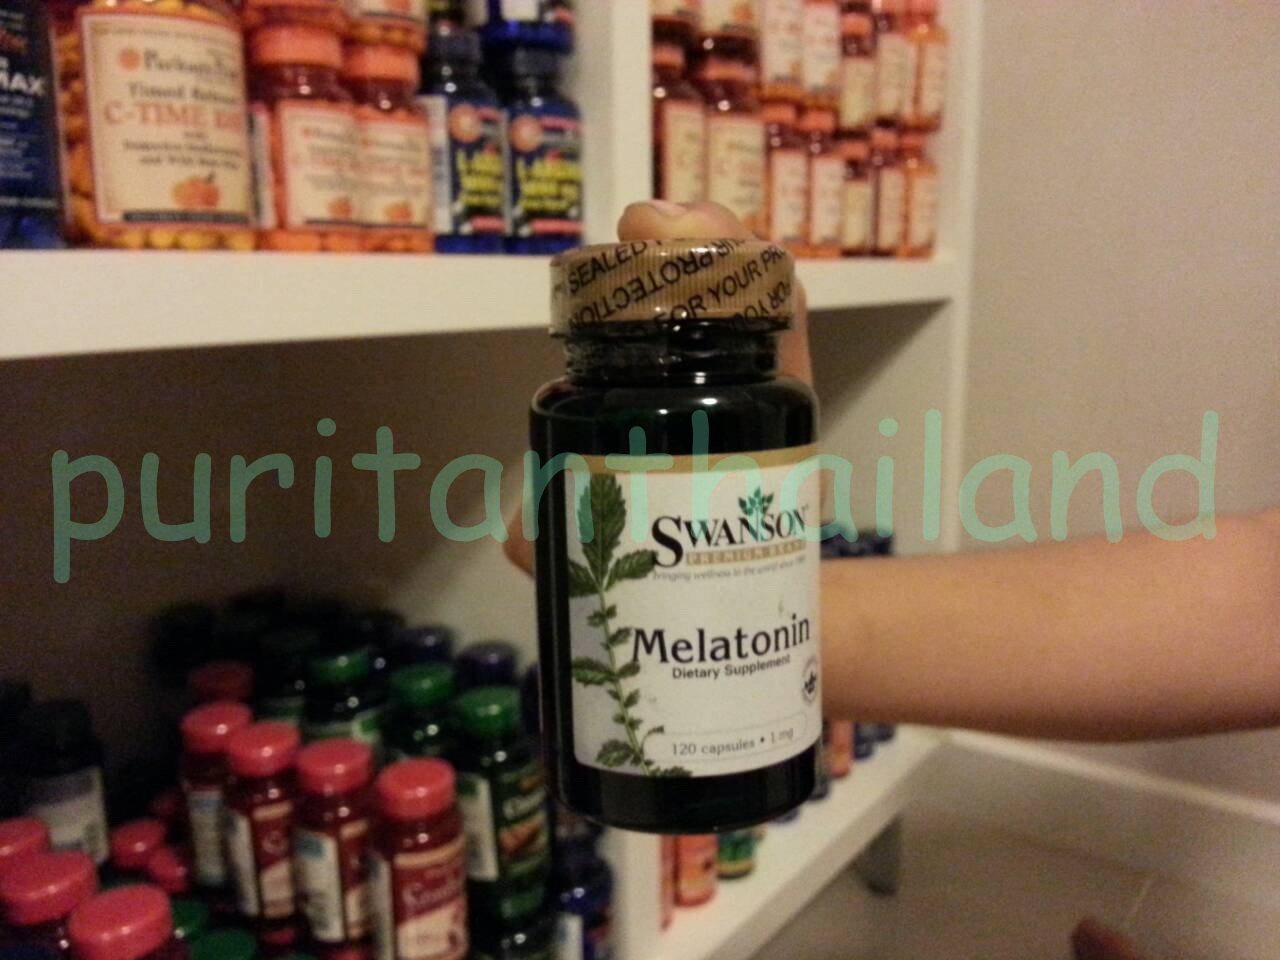 Swanson Melatonin 1mg. 120 capsules